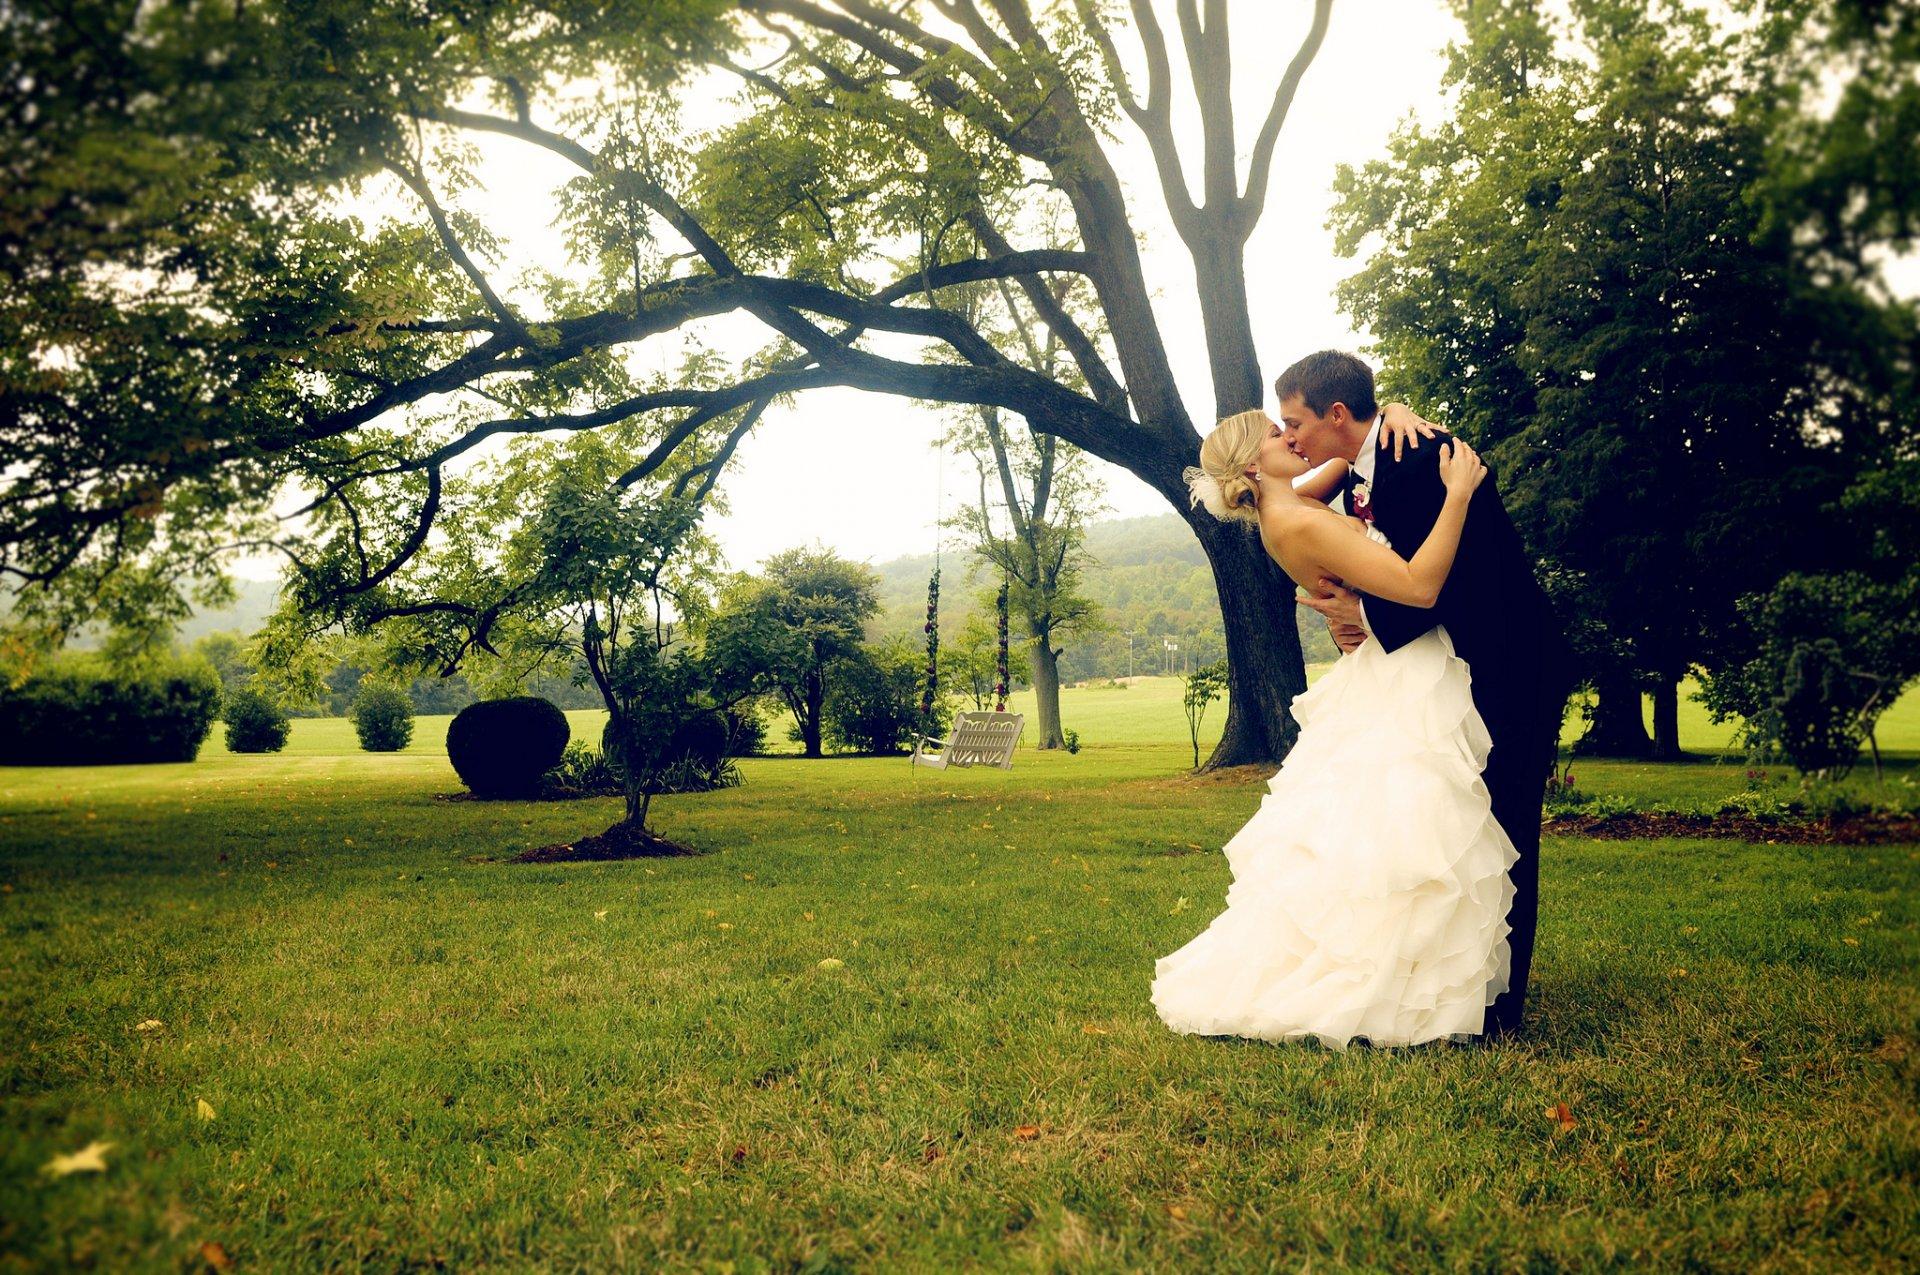 Картинки парень девушка свадьба